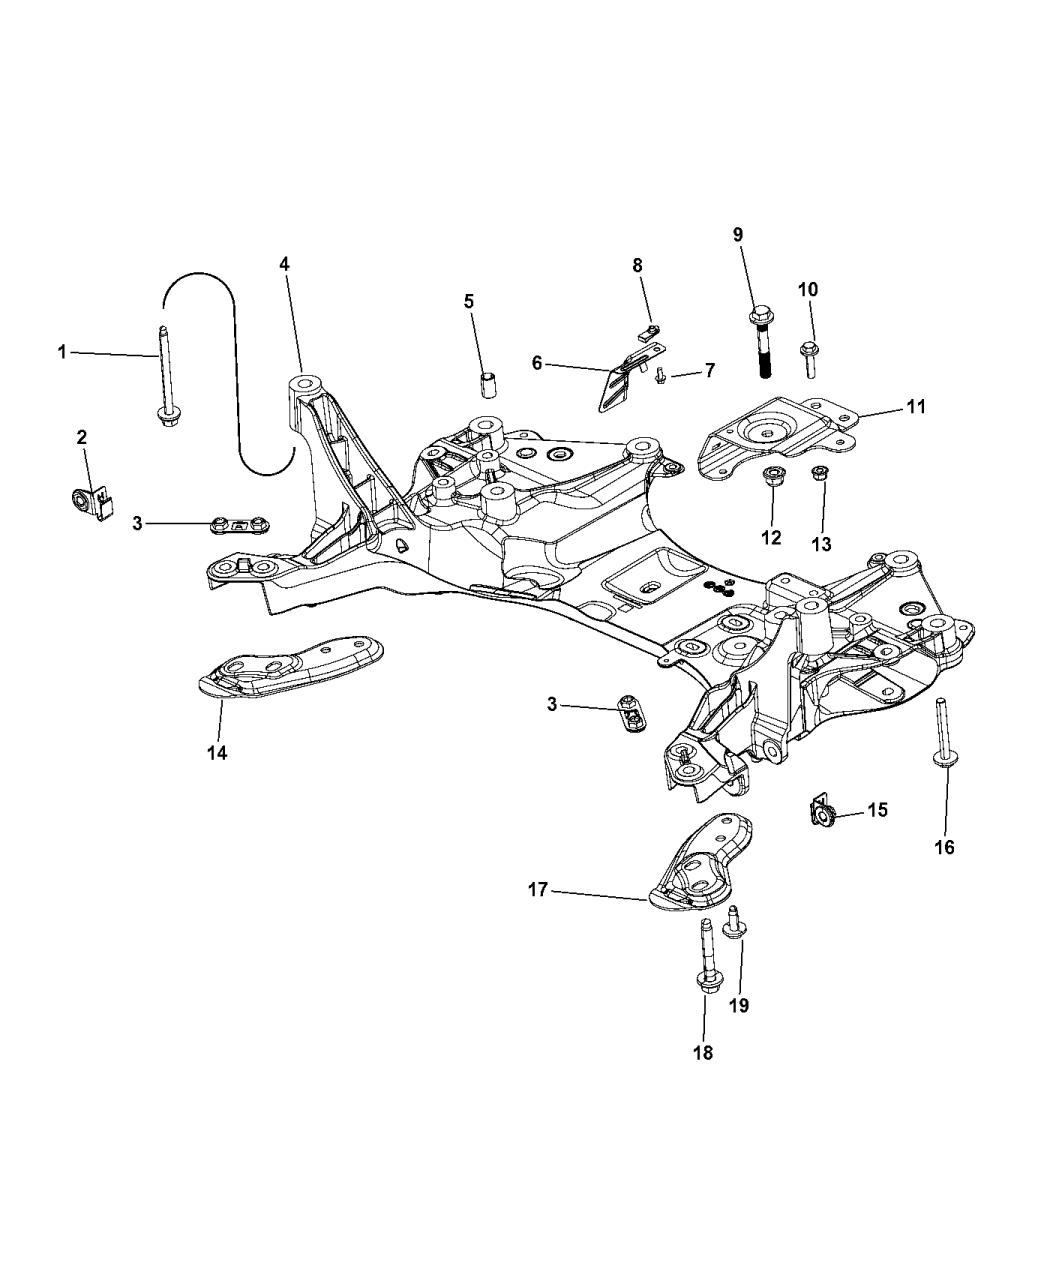 2014 jeep cherokee cradle - front suspension